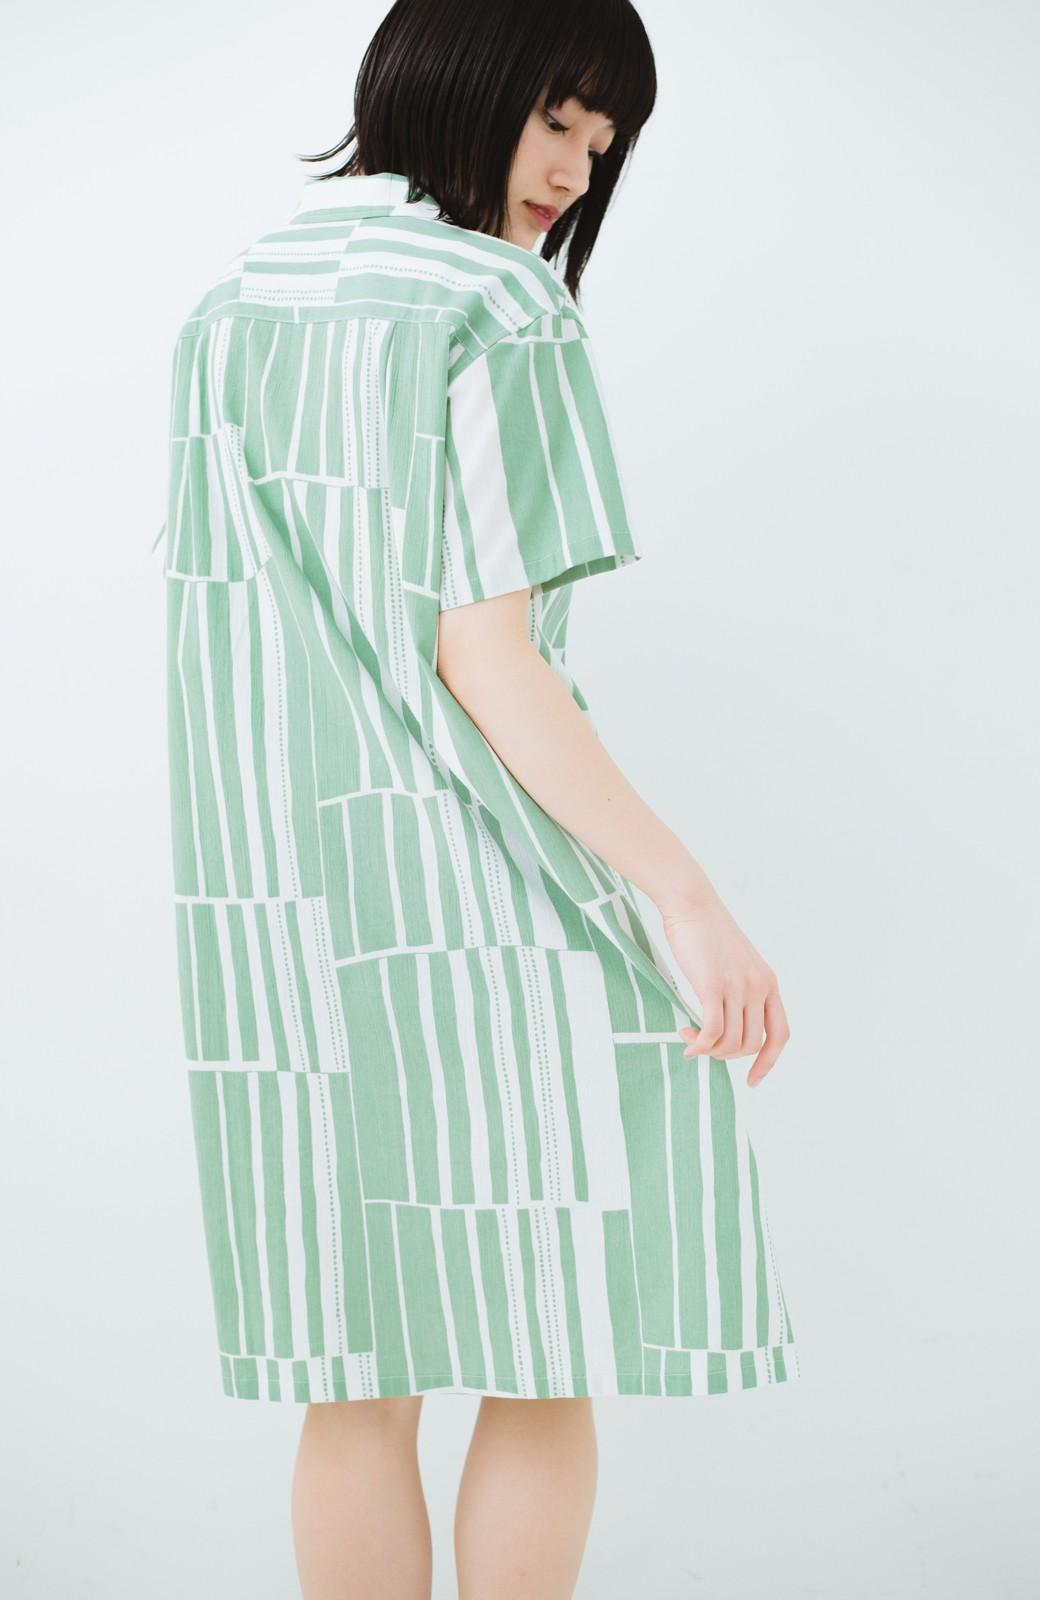 haco! 京都の浴衣屋さんと作った浴衣生地のシャツワンピース <グリーン系その他>の商品写真19